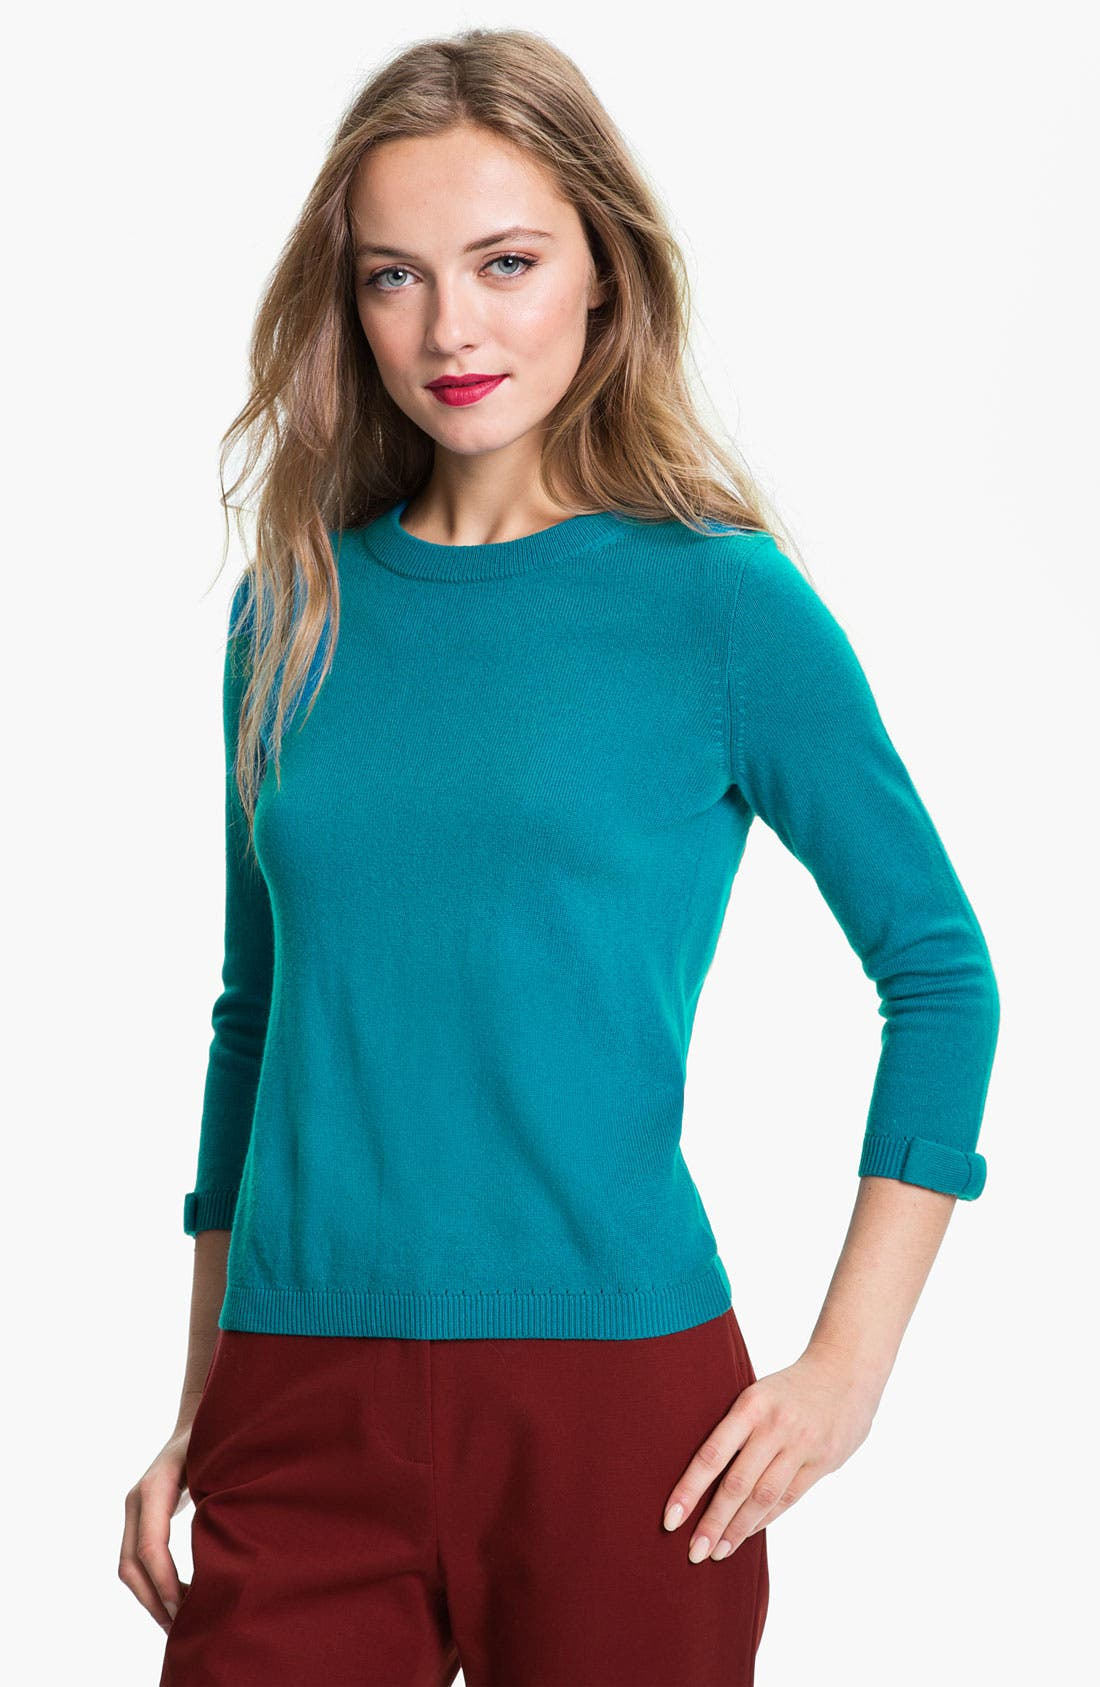 Alternate Image 1 Selected - kate spade new york 'arianna' sweater